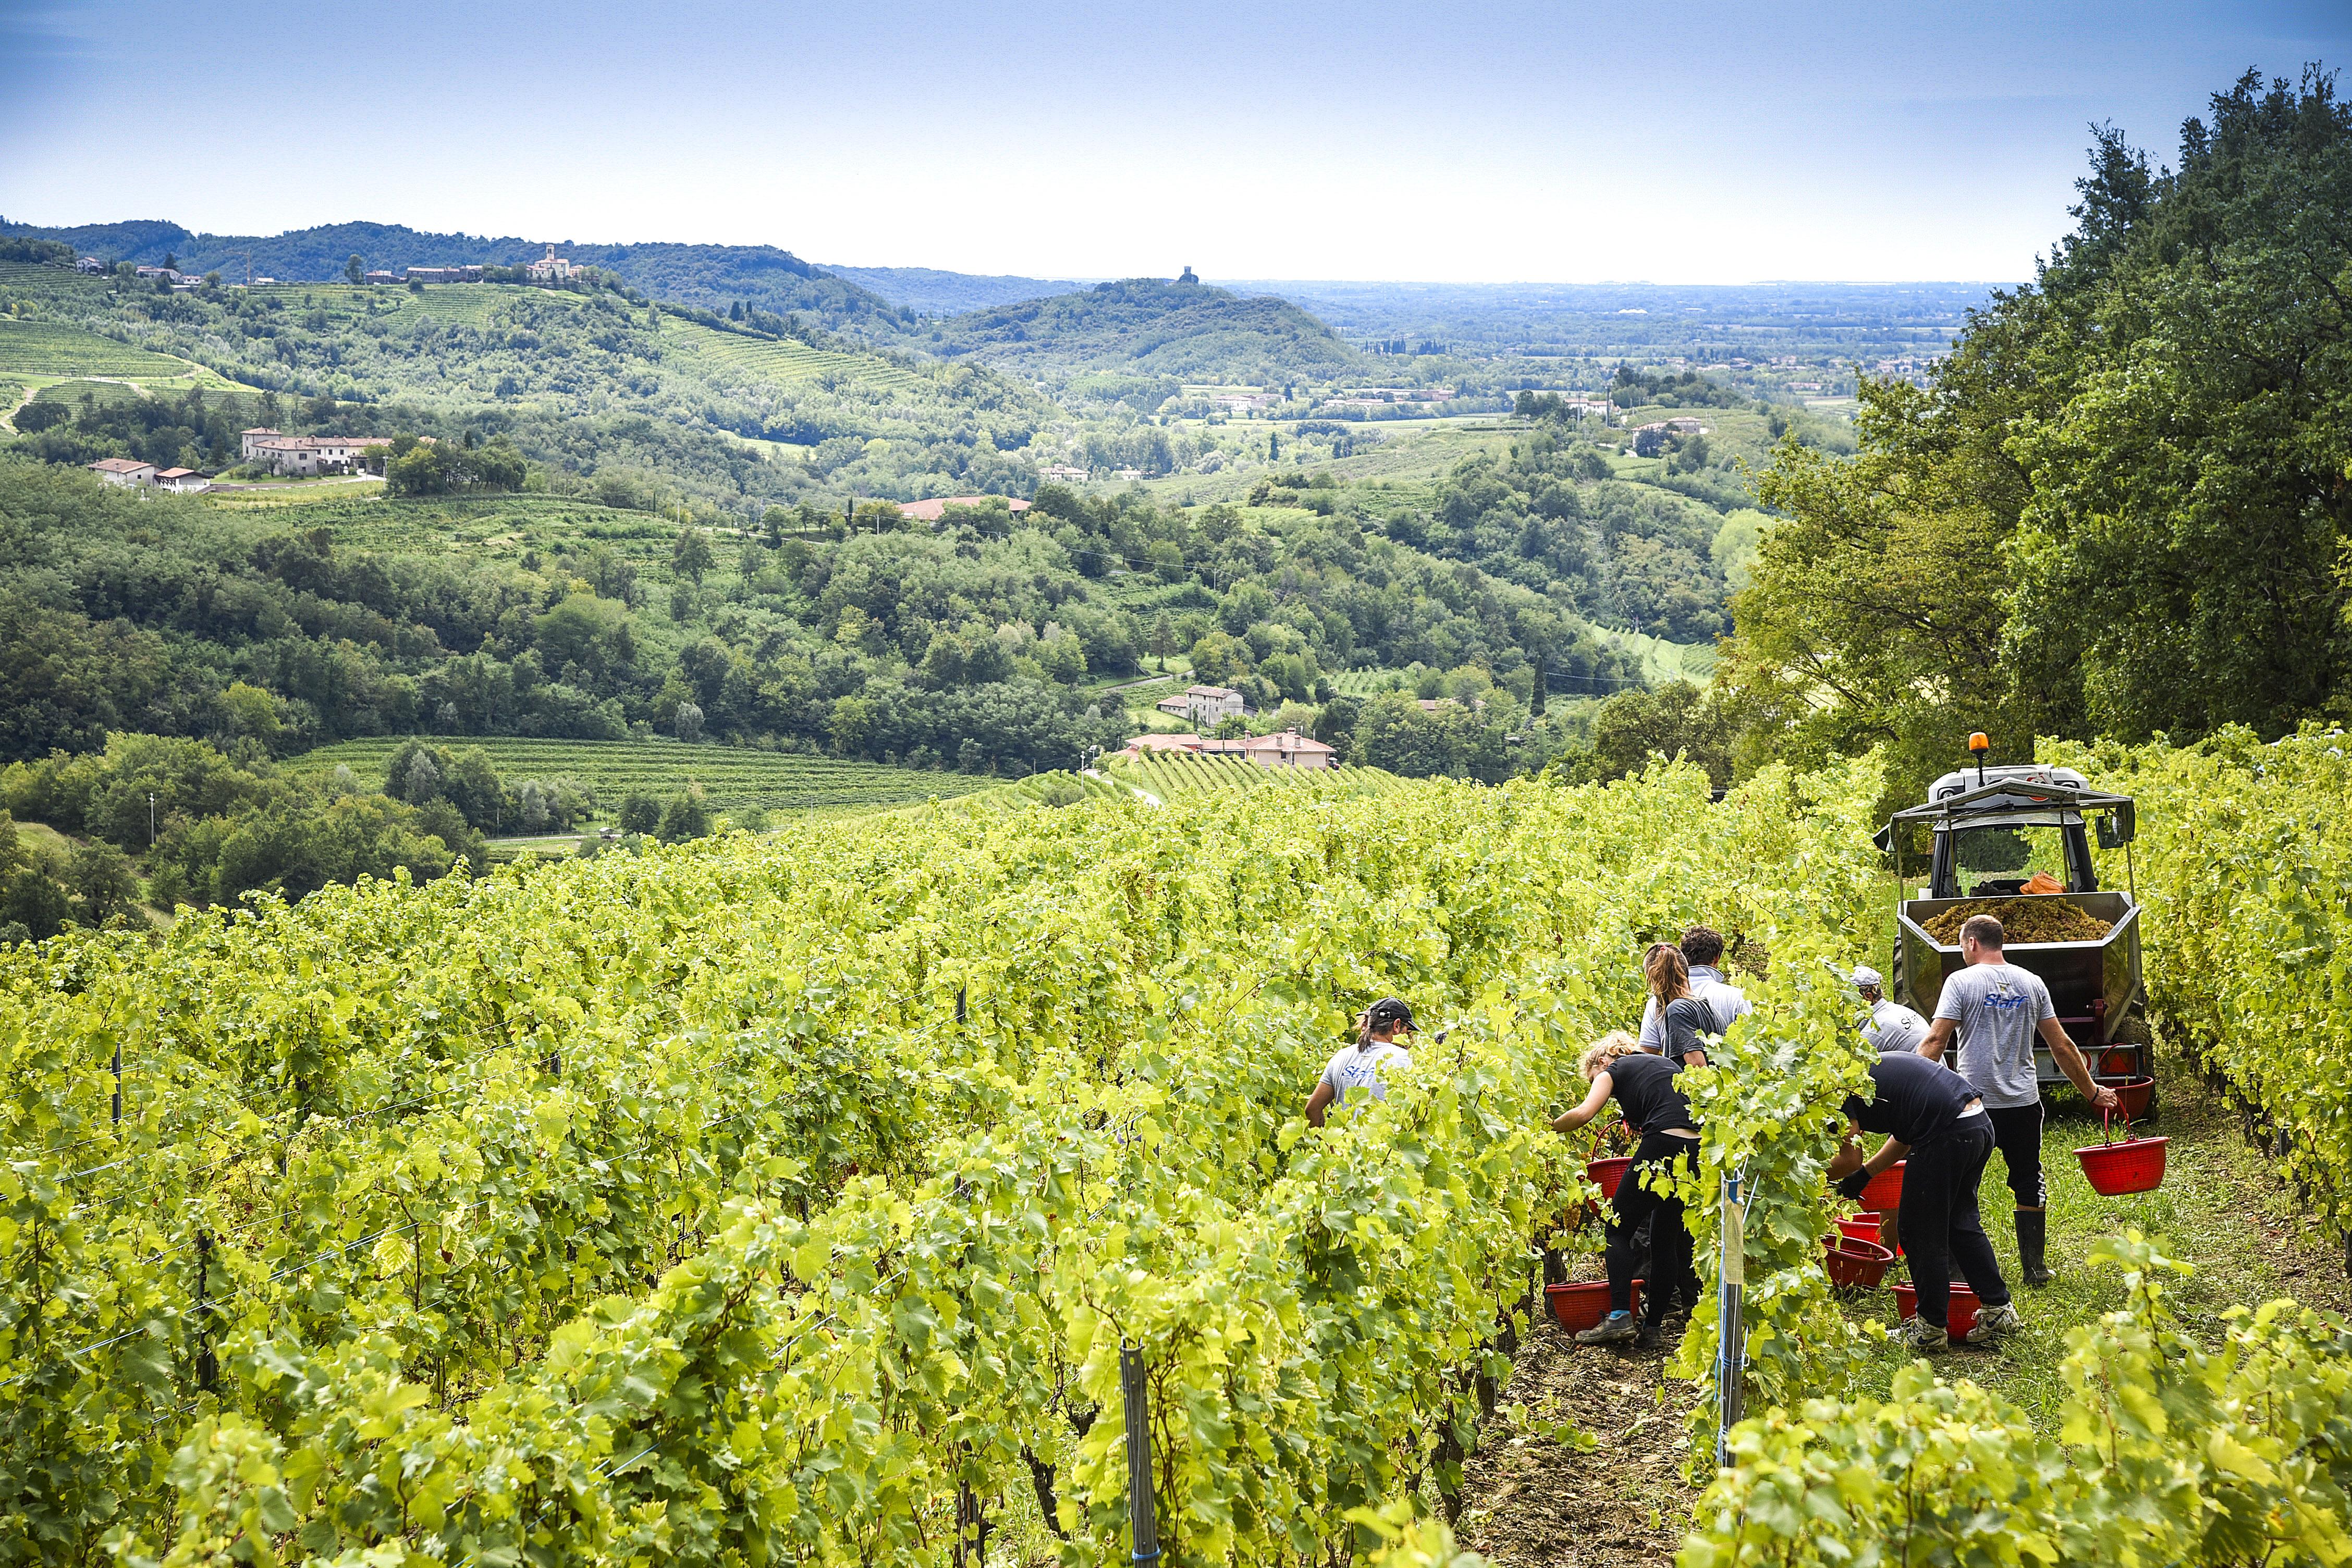 Venica & Venica Wine Resort in den Collio, im Friaul.